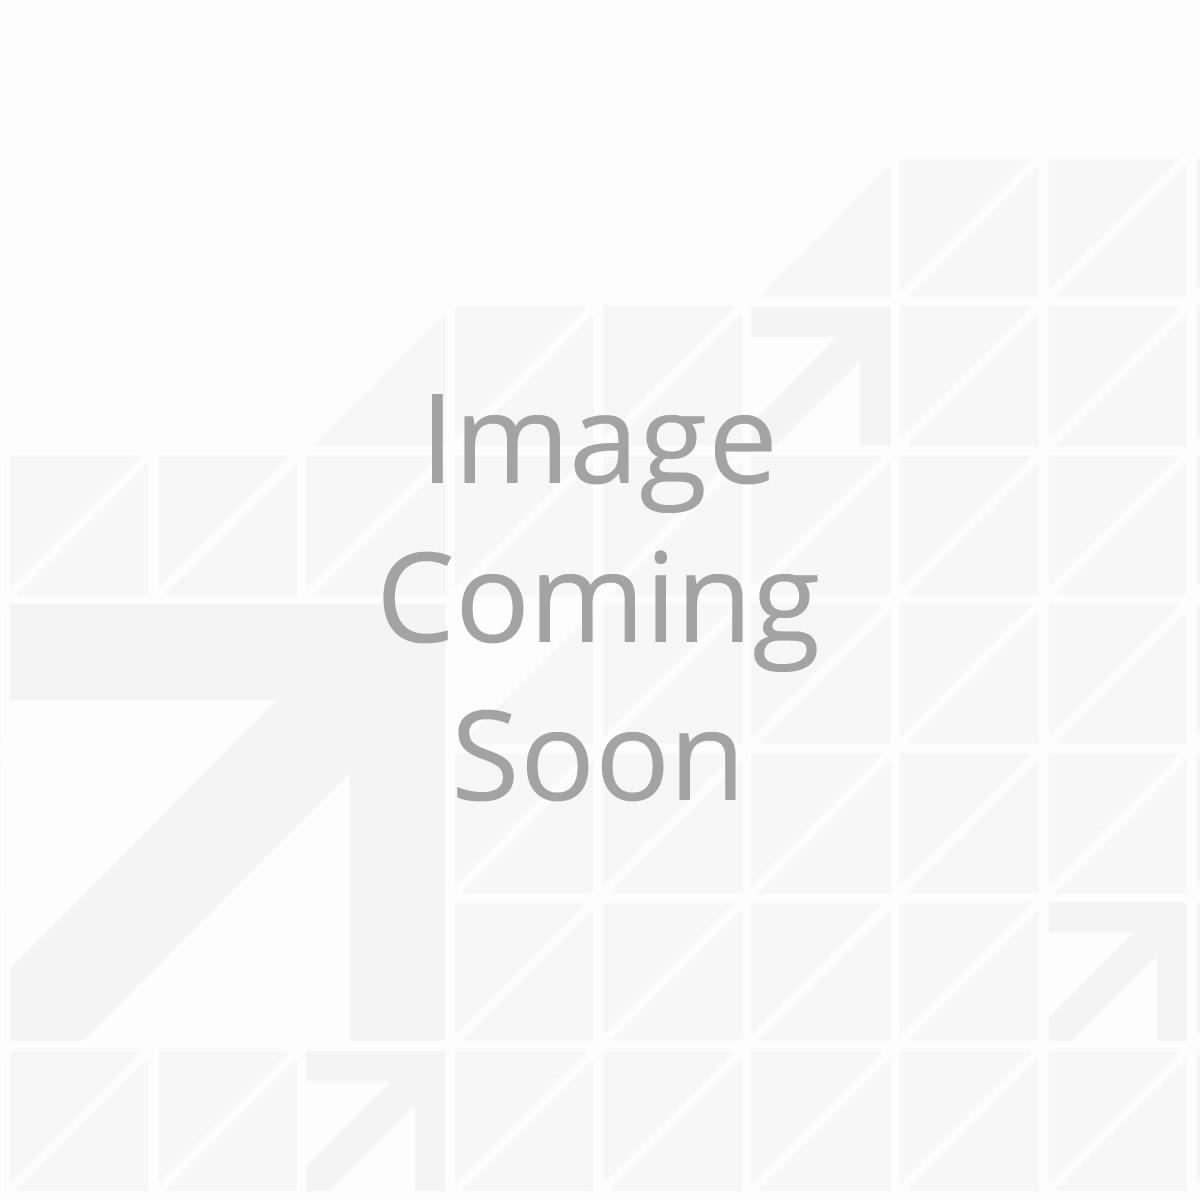 359460_-_pg_leveling_service_kit_-_001